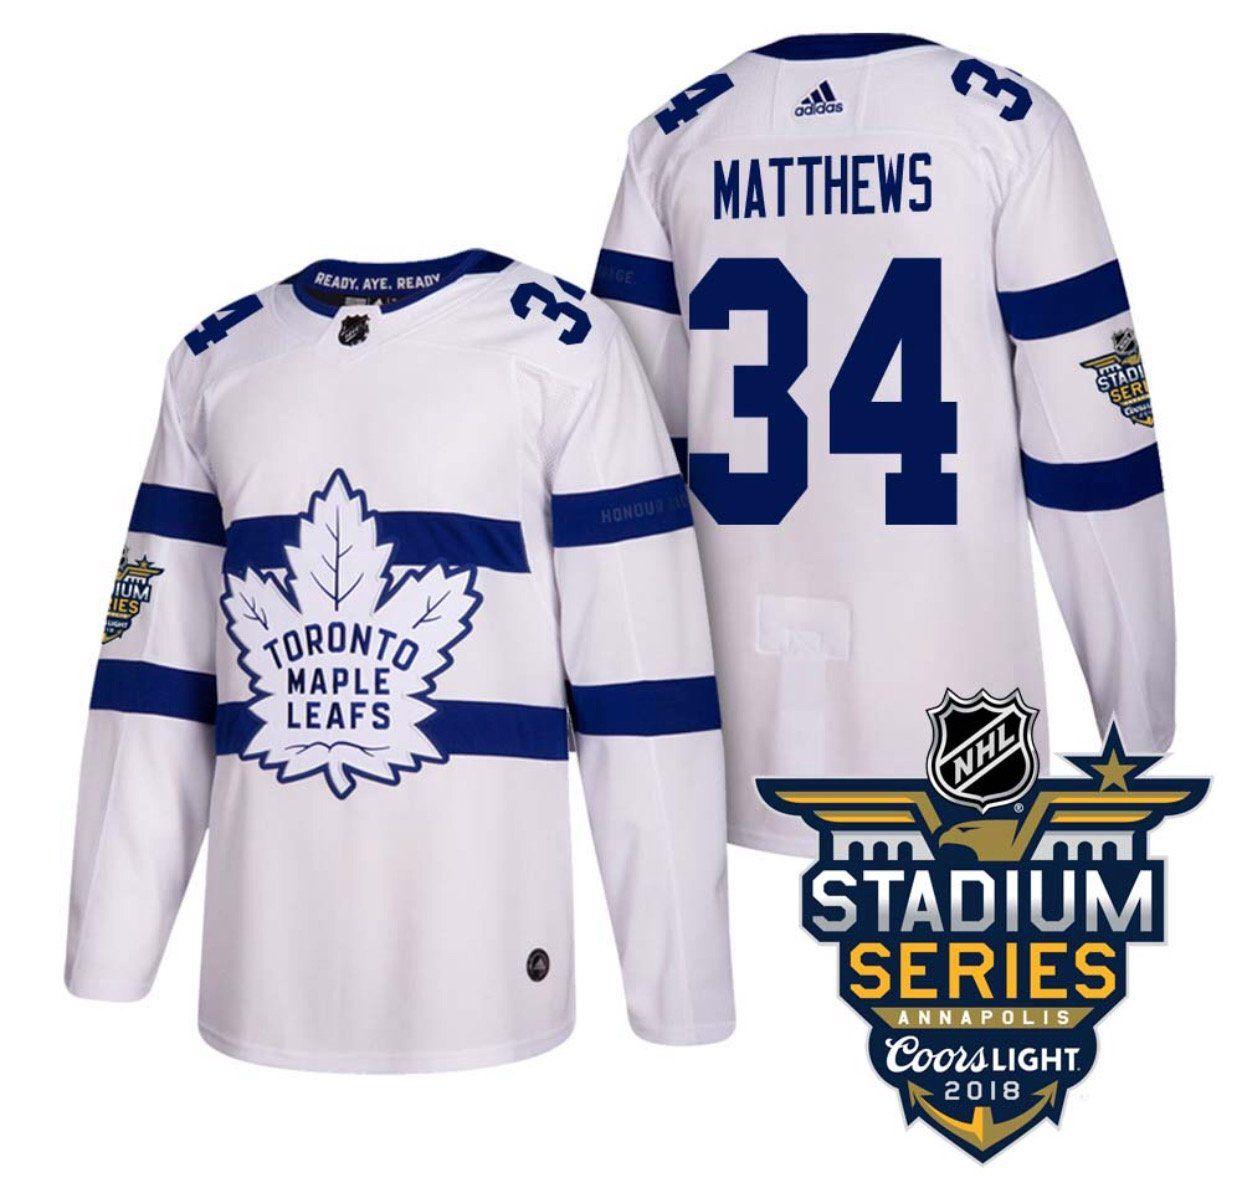 timeless design 2630a 6f502 2018 Coors Stadium Series Toronto Maple Leafs Premier Adidas ...